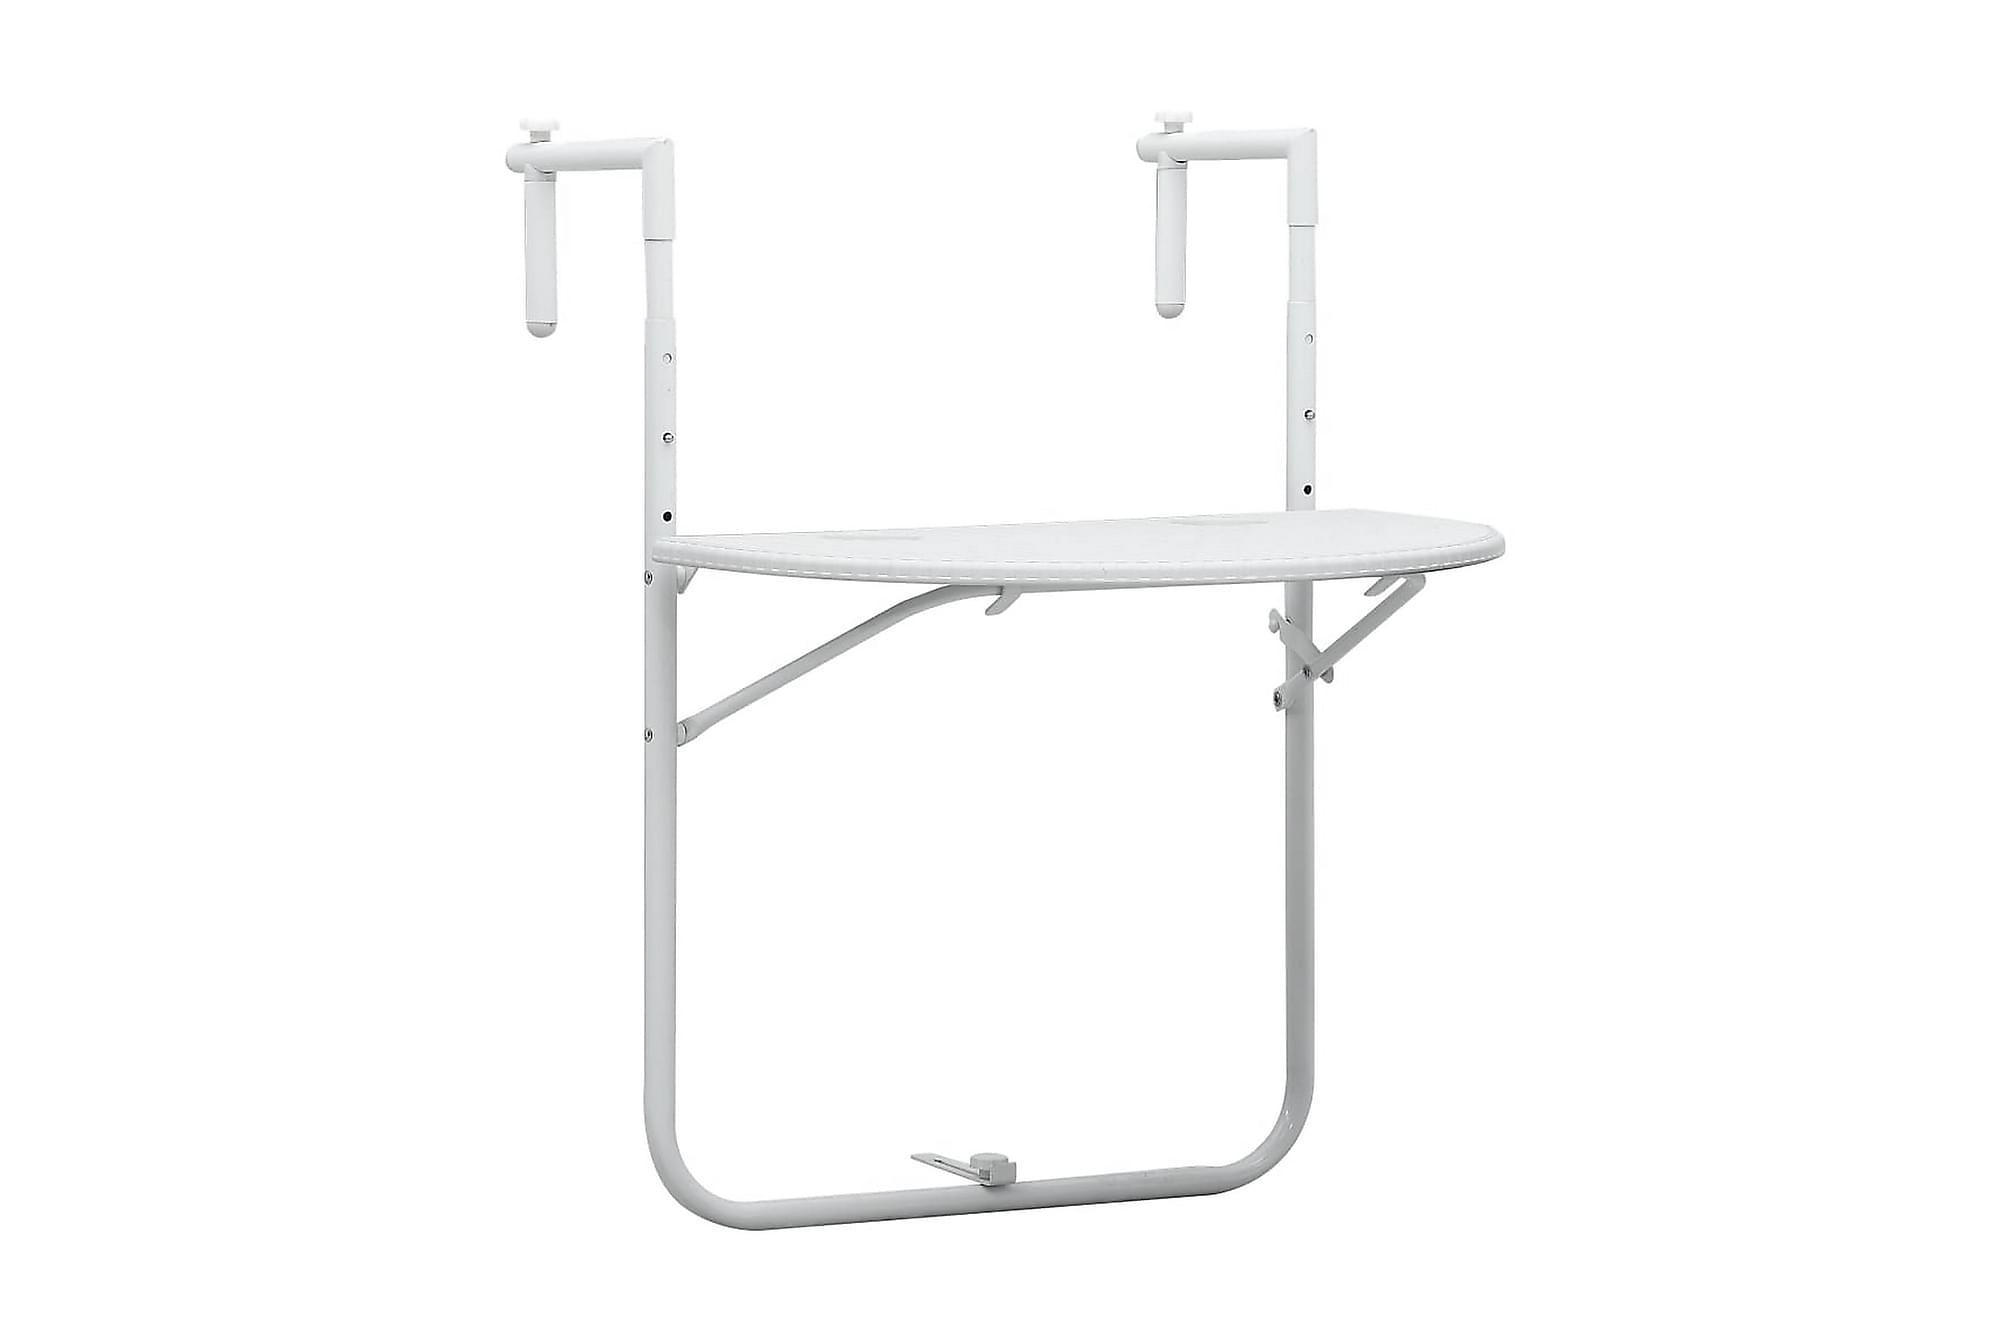 Balkongbord vit 60x64x83,5 cm plast konstrotting